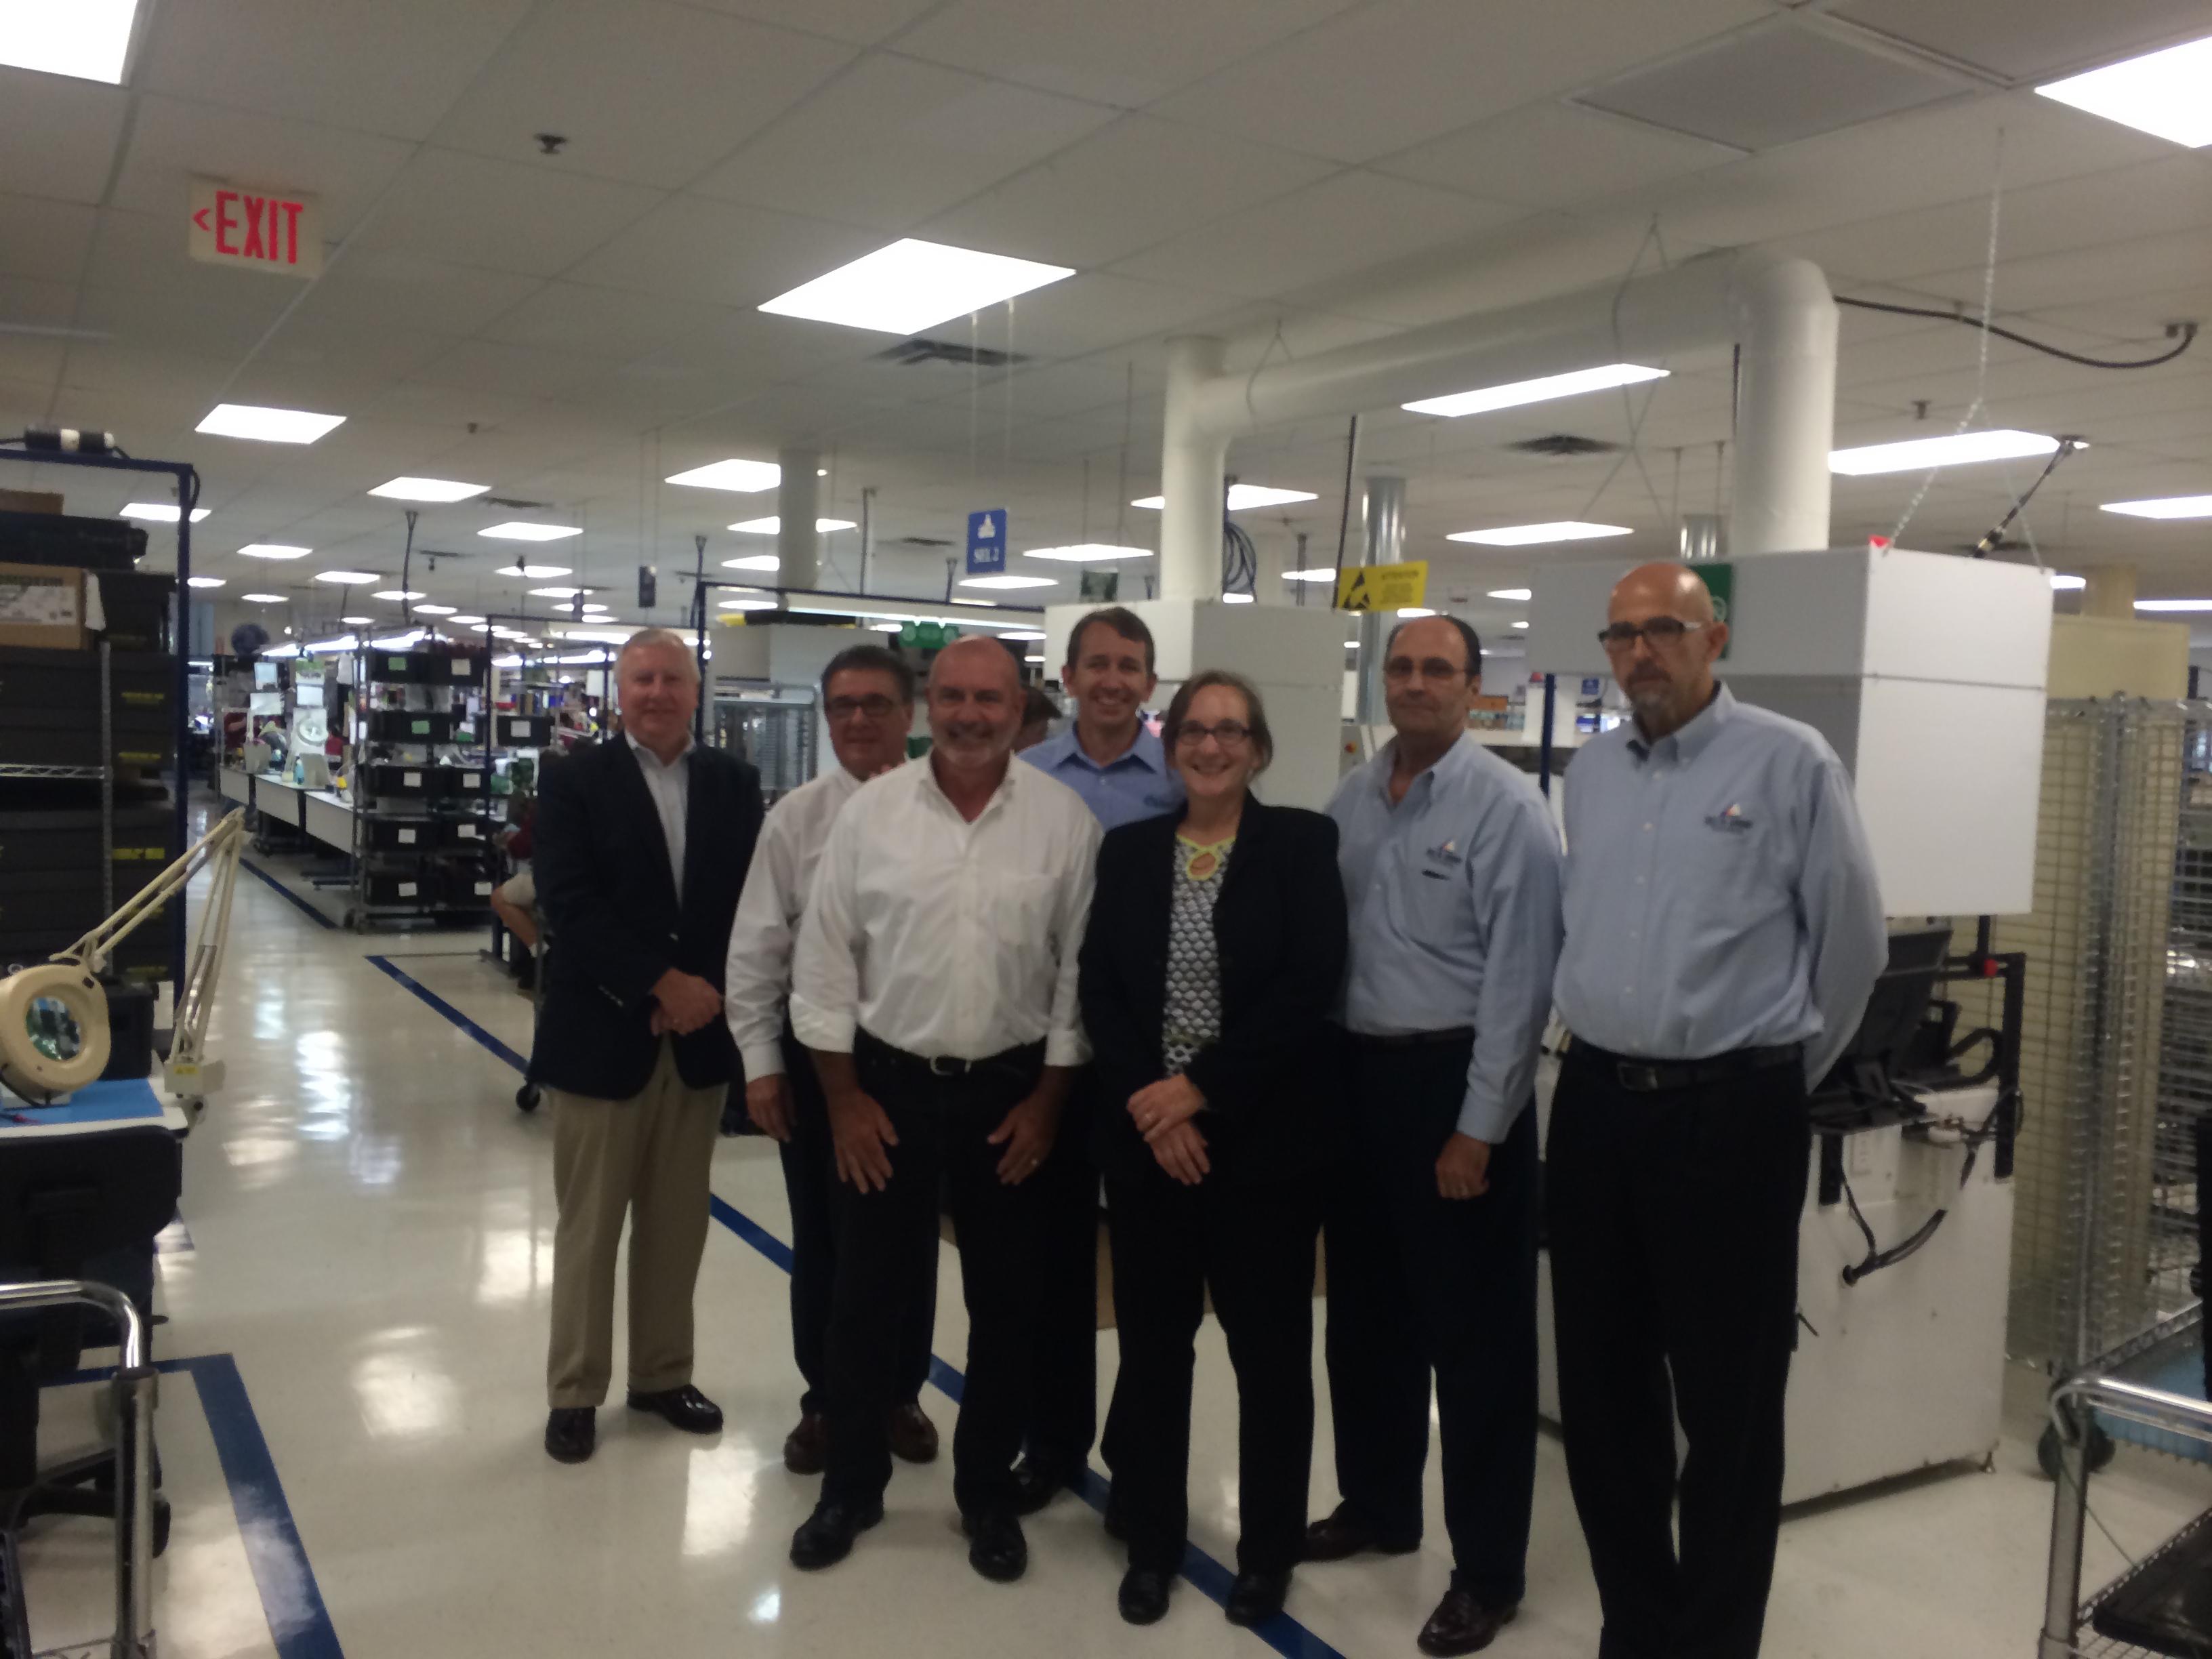 Delta Group CEO Harry Mueller, Ron Reef, Chris Gunn, Quantum CEO Mark Tinker, Cindy Drapcho, Zoran Jecmenica, Chris Brewer